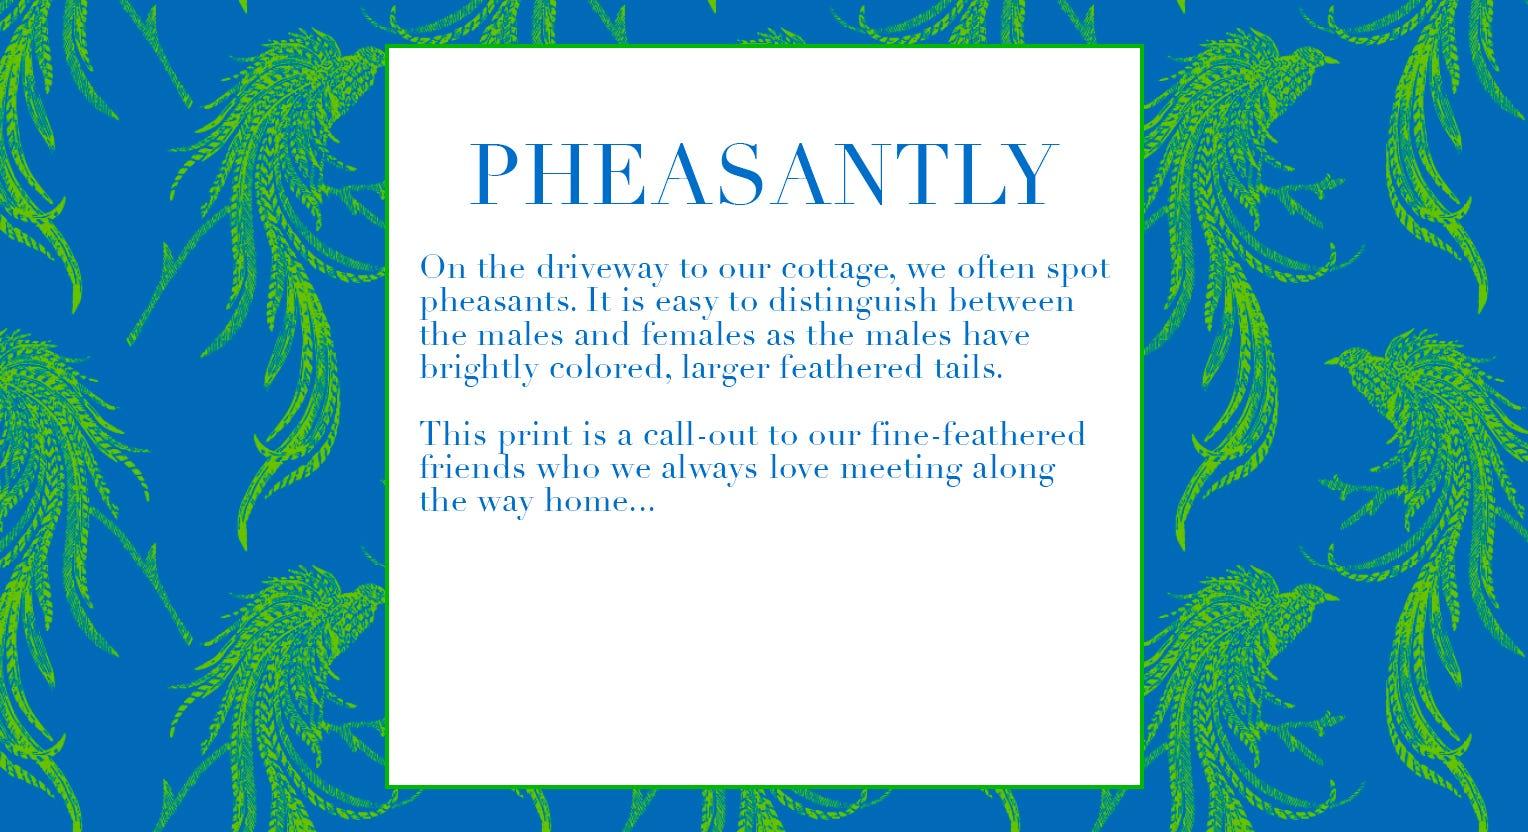 Pheasantly